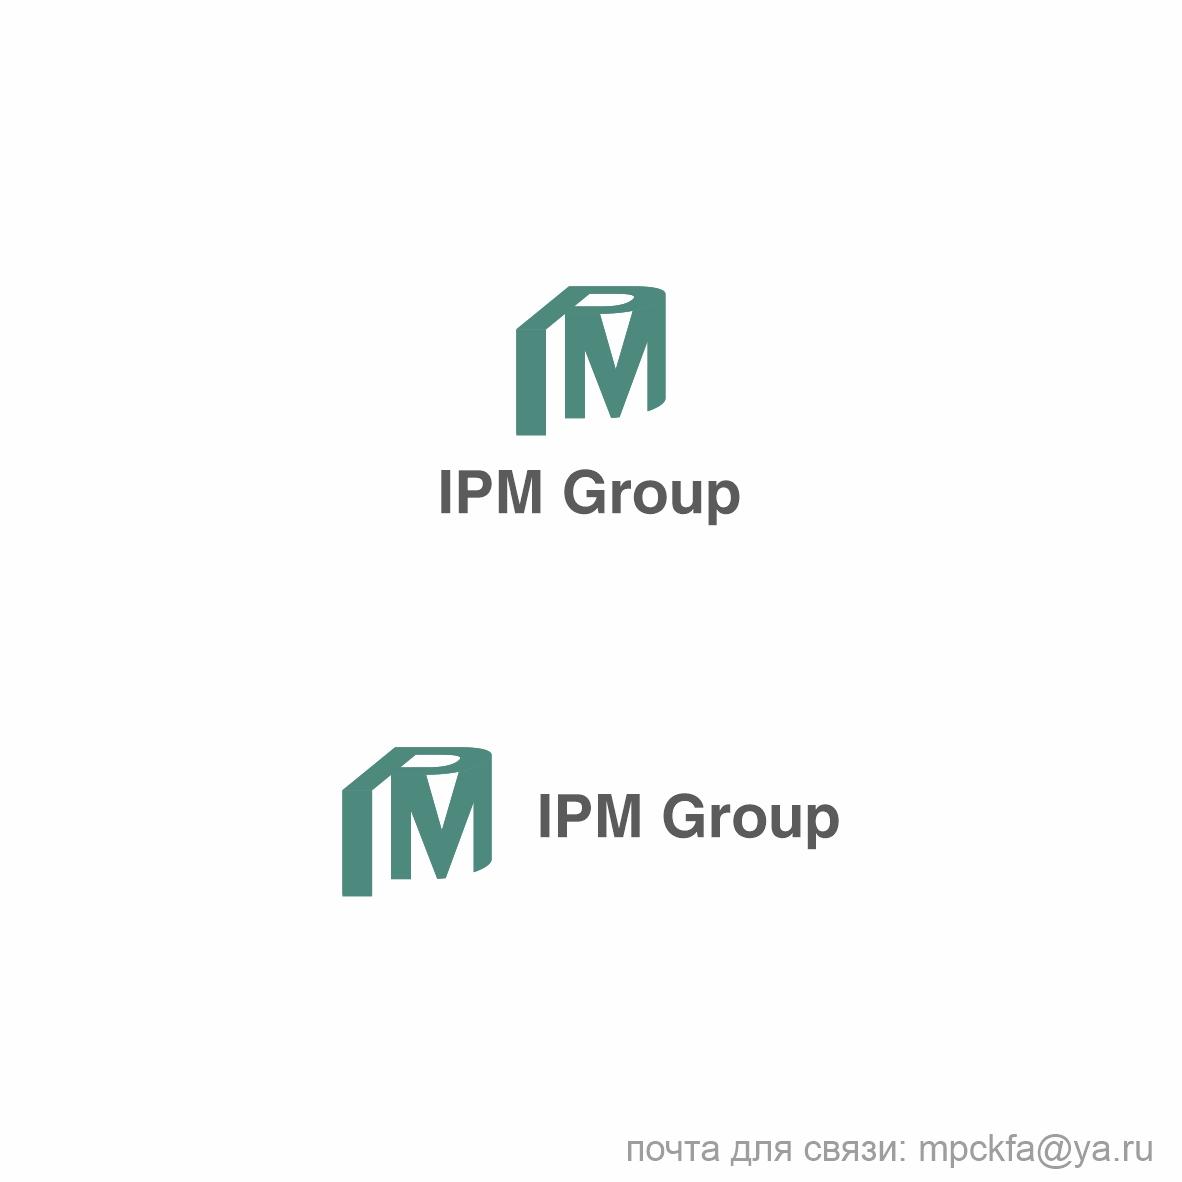 Разработка логотипа для управляющей компании фото f_1865f831316e4bf6.jpg